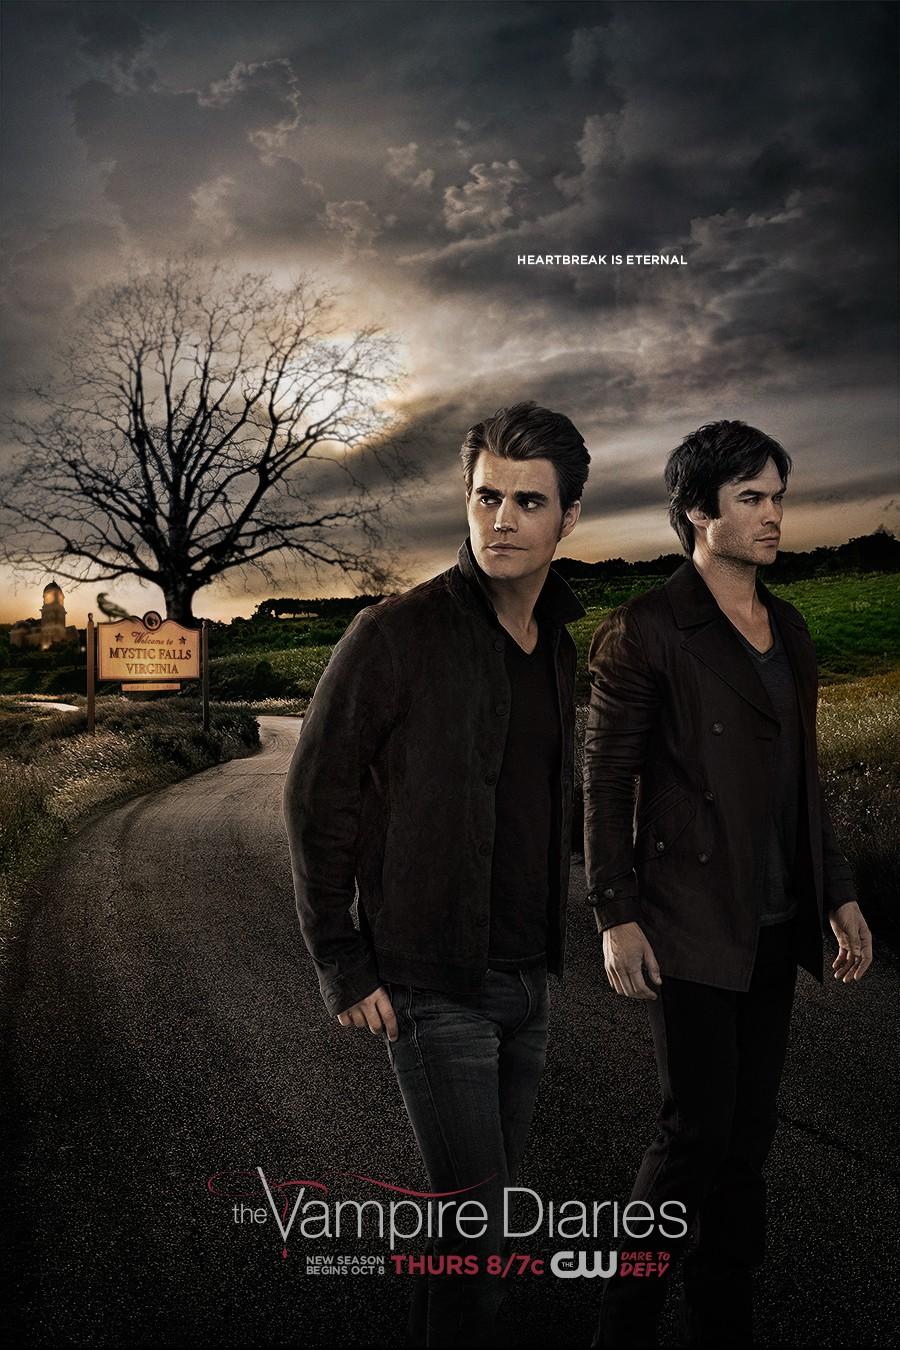 Дневники вампира 7-8 сезон 1-6 серия СУБТИТРЫ | The Vampire Diaries